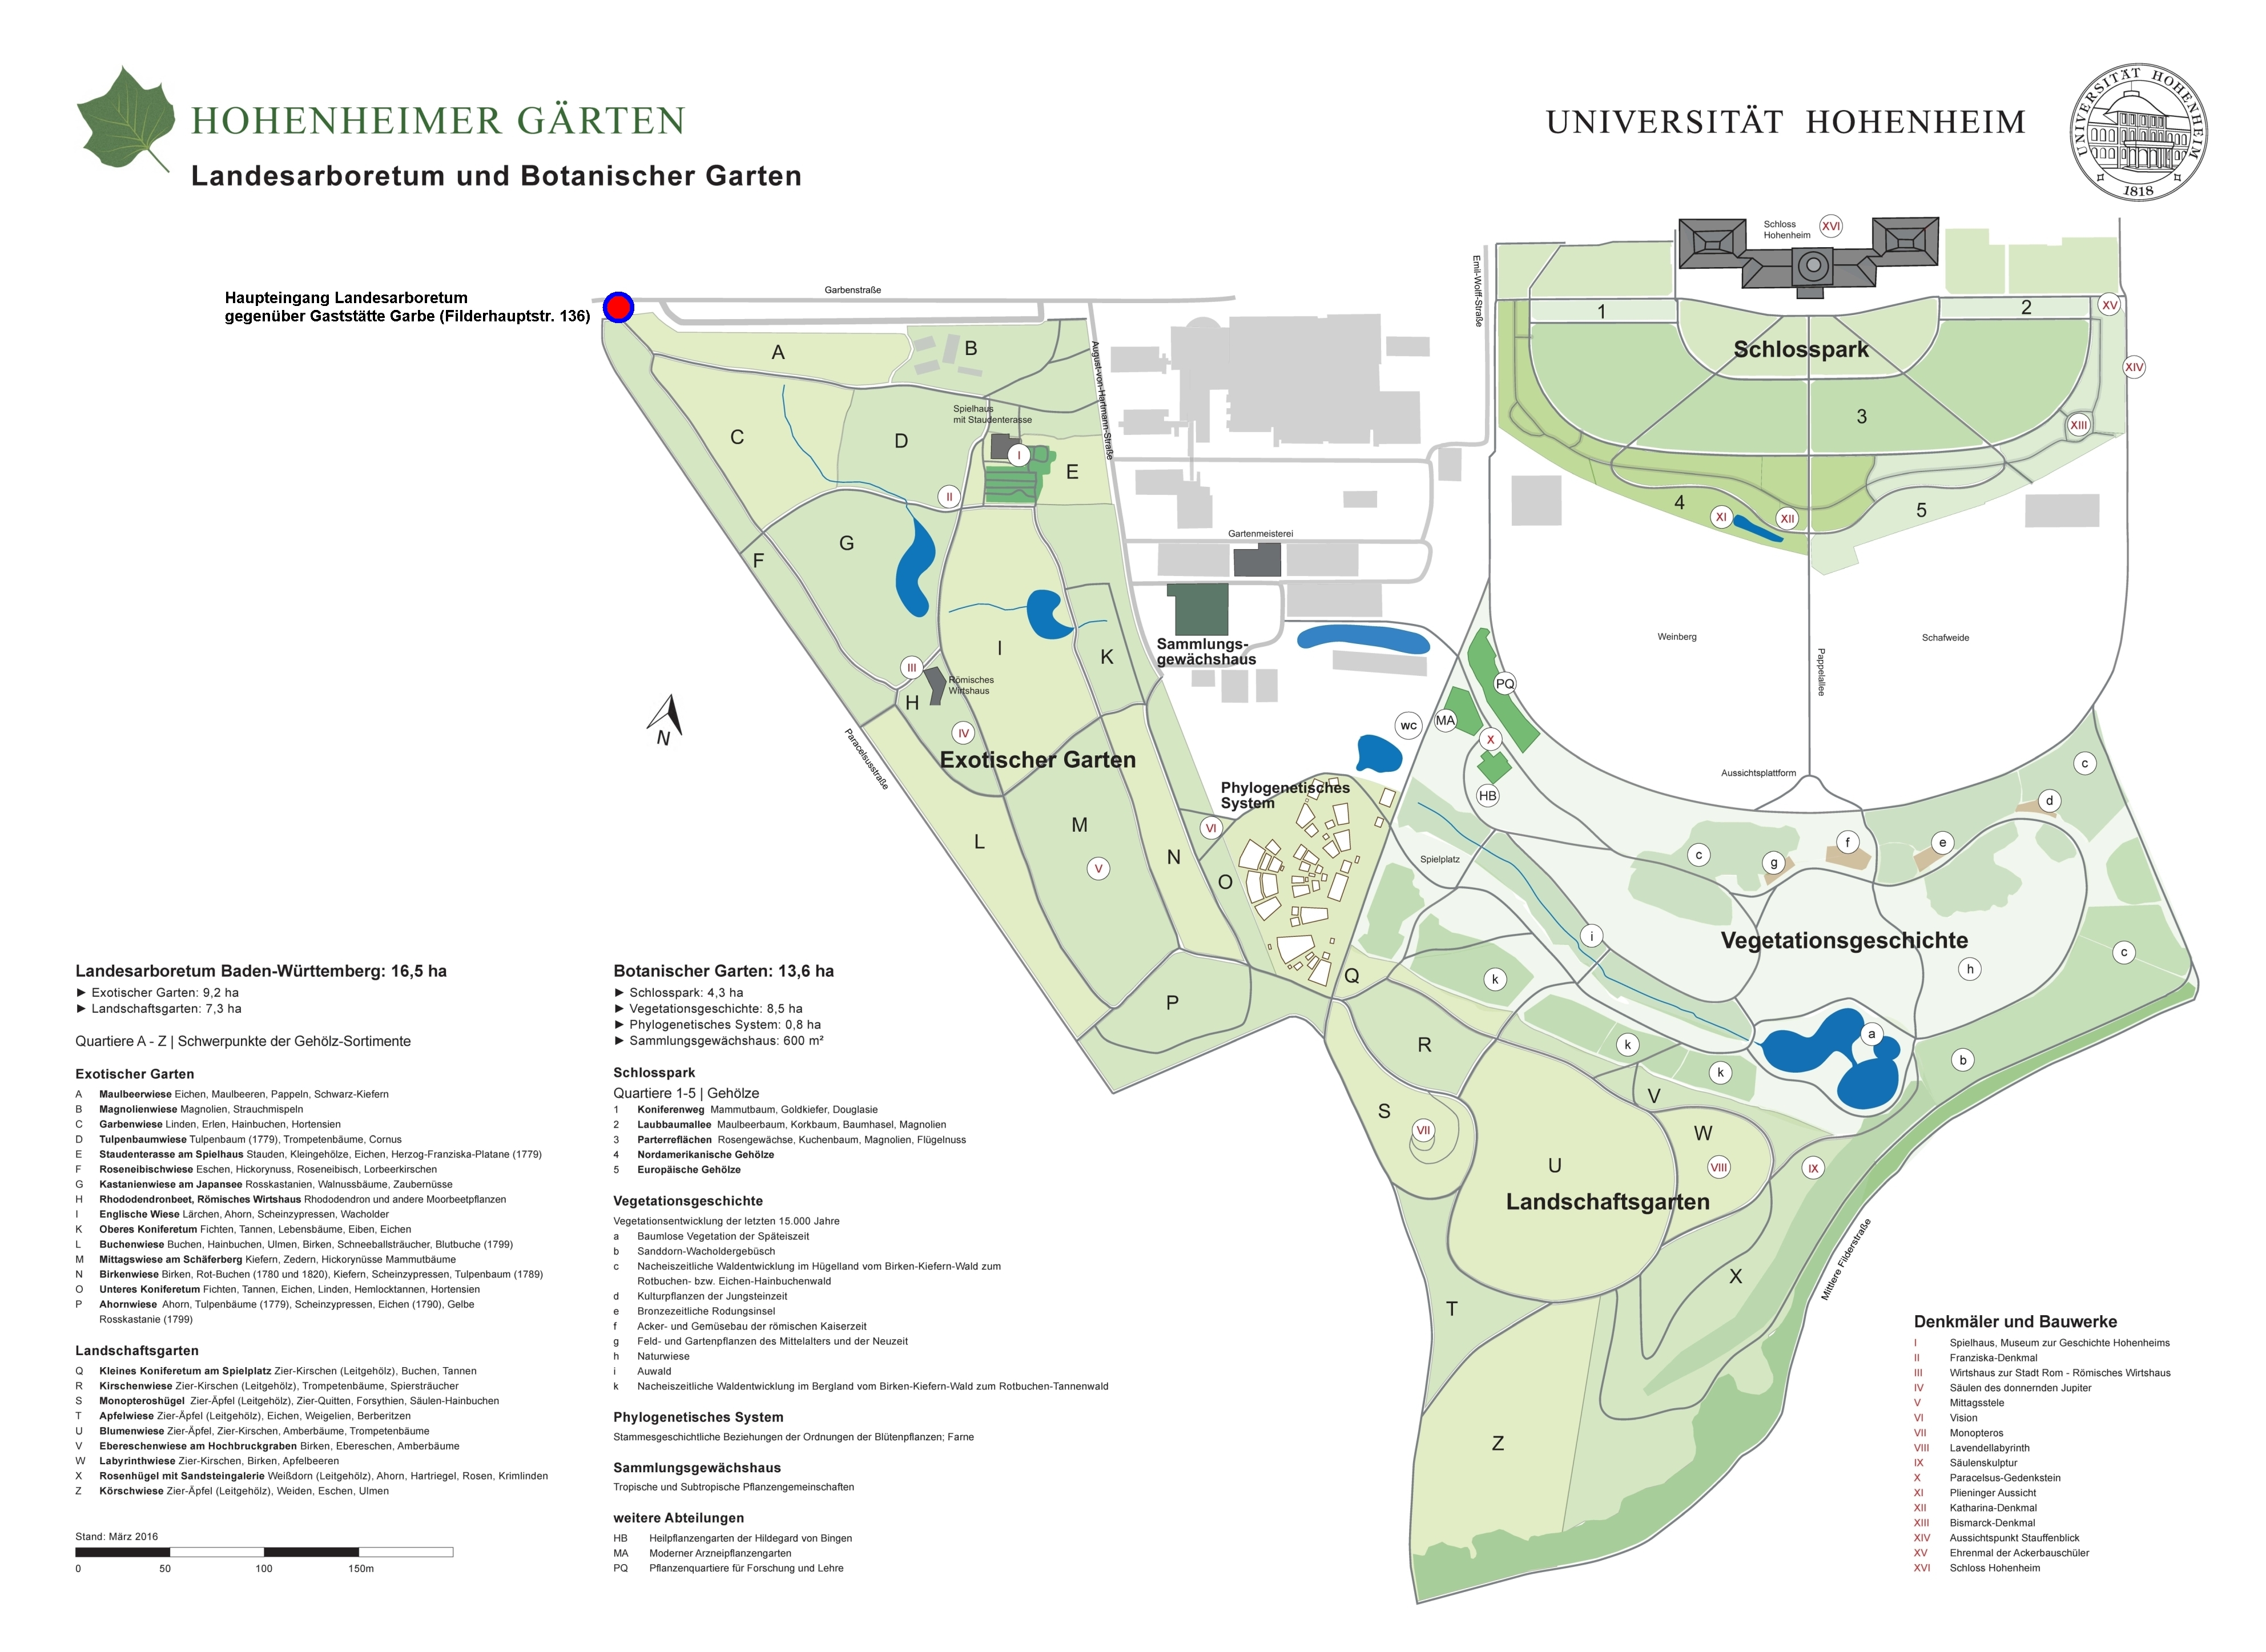 Gartenplan  Botanischer Garten: Hohenheimer Gärten